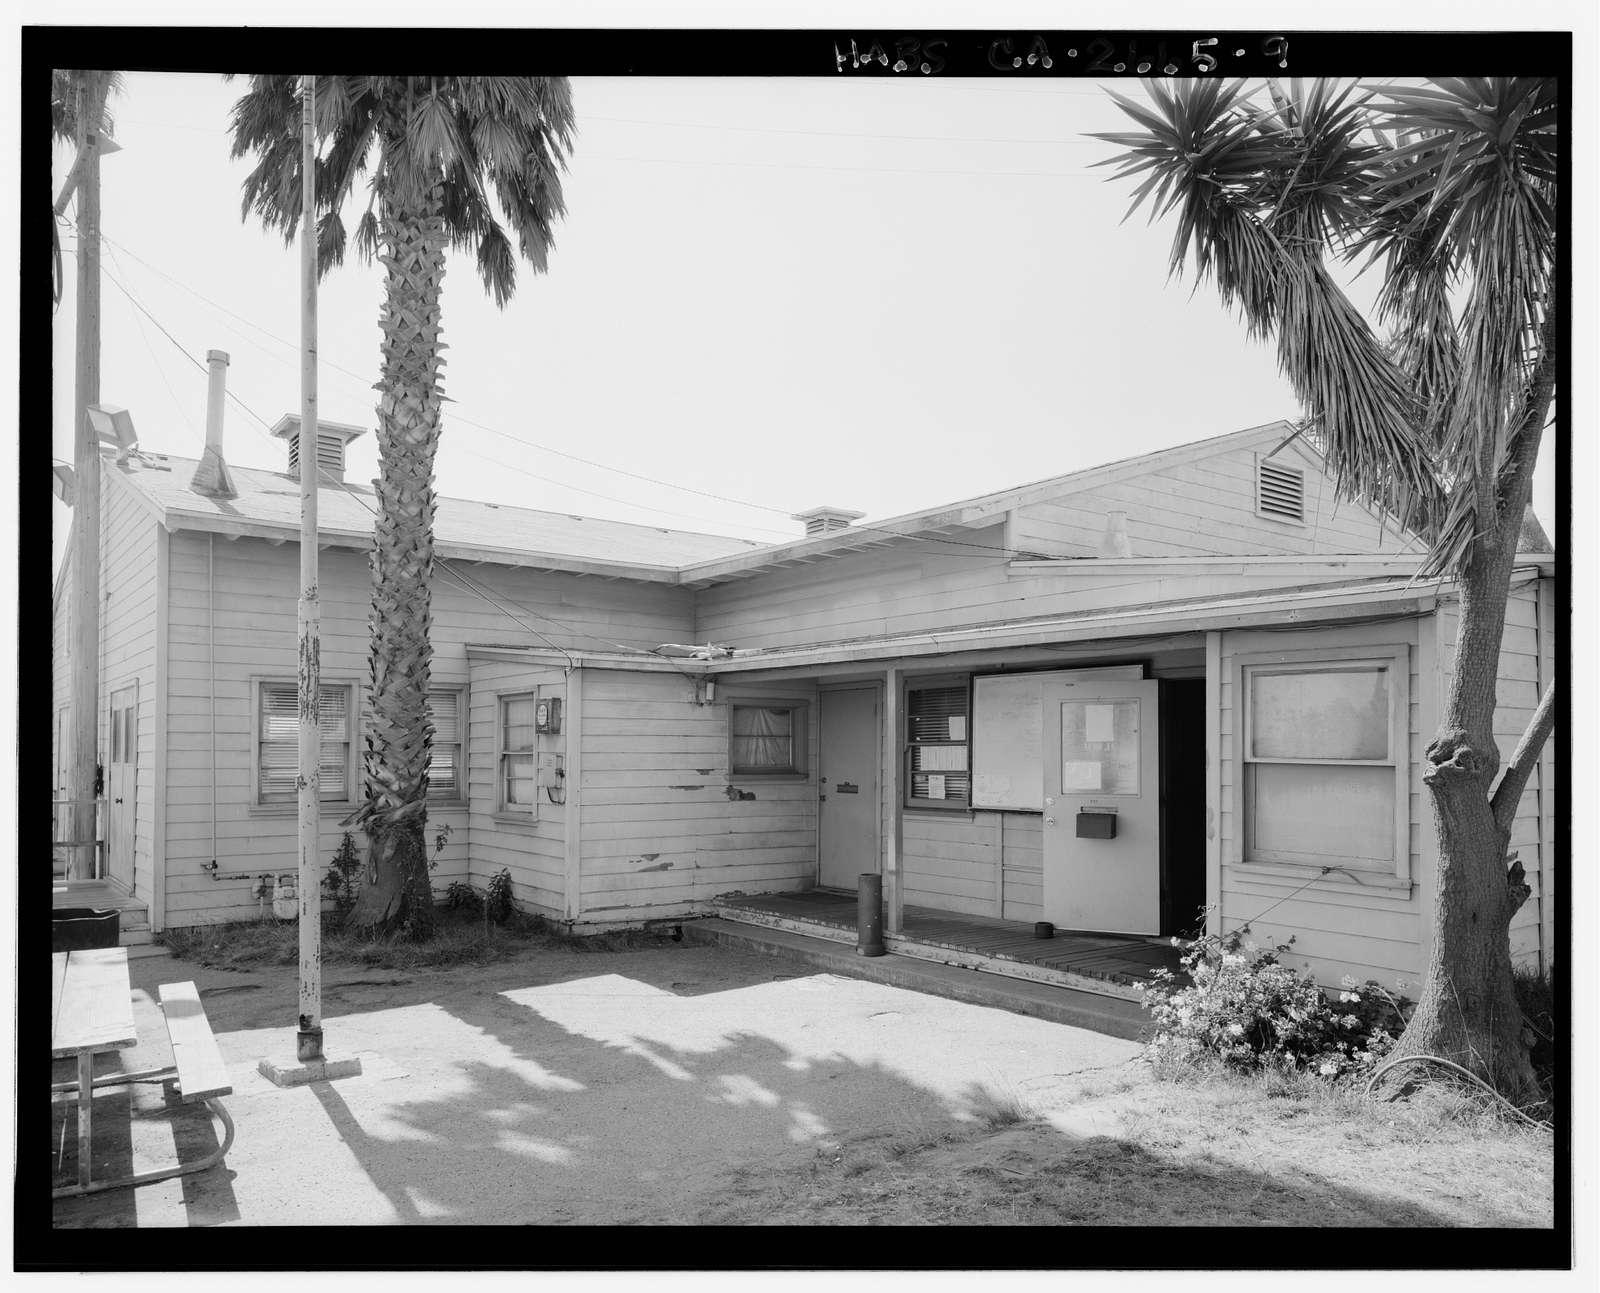 International Longshoremen's & Warehousemen's Union Hall, Naval Civil Engineering Laboratory, Port Hueneme Road, Port Hueneme, Ventura County, CA